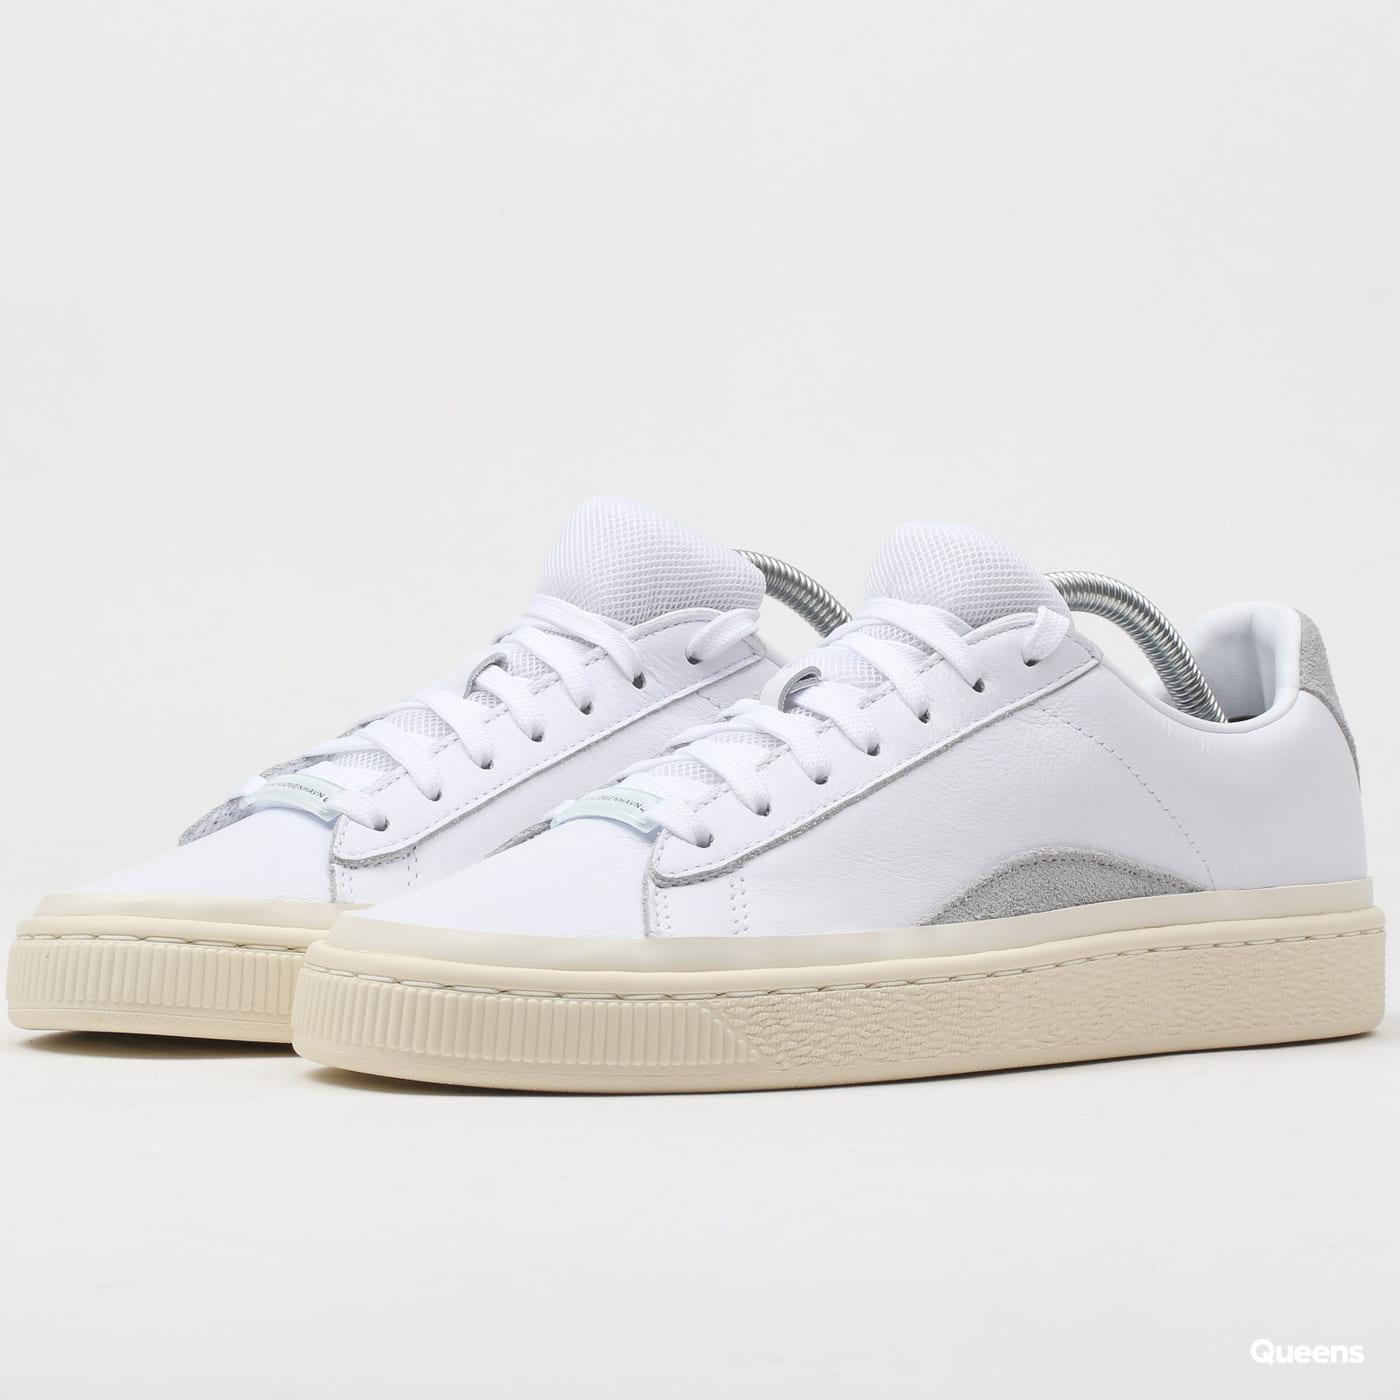 buy popular 79544 9d233 Puma Basket x HAN KJOBENHAVN puma white - whisper white